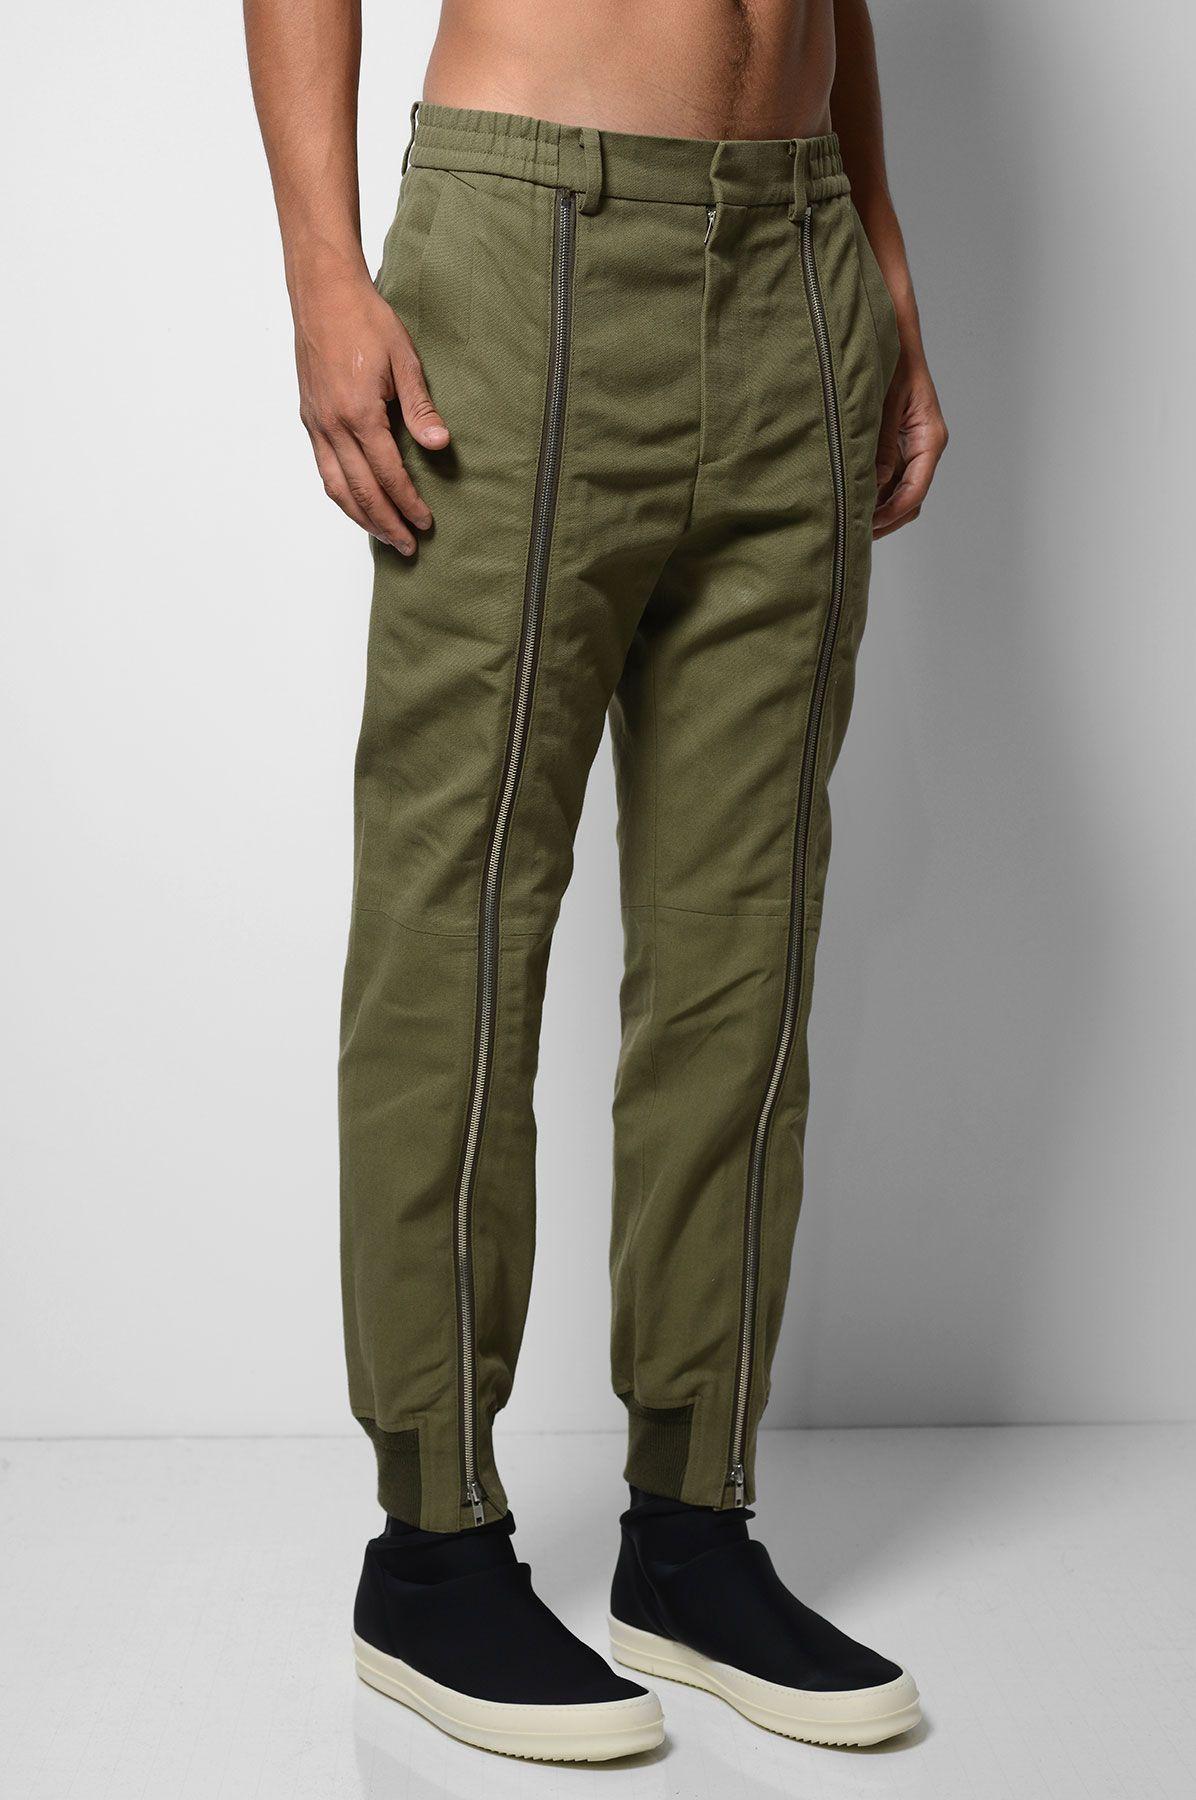 JUUN J Khaki Zip Trousers | Bespoke